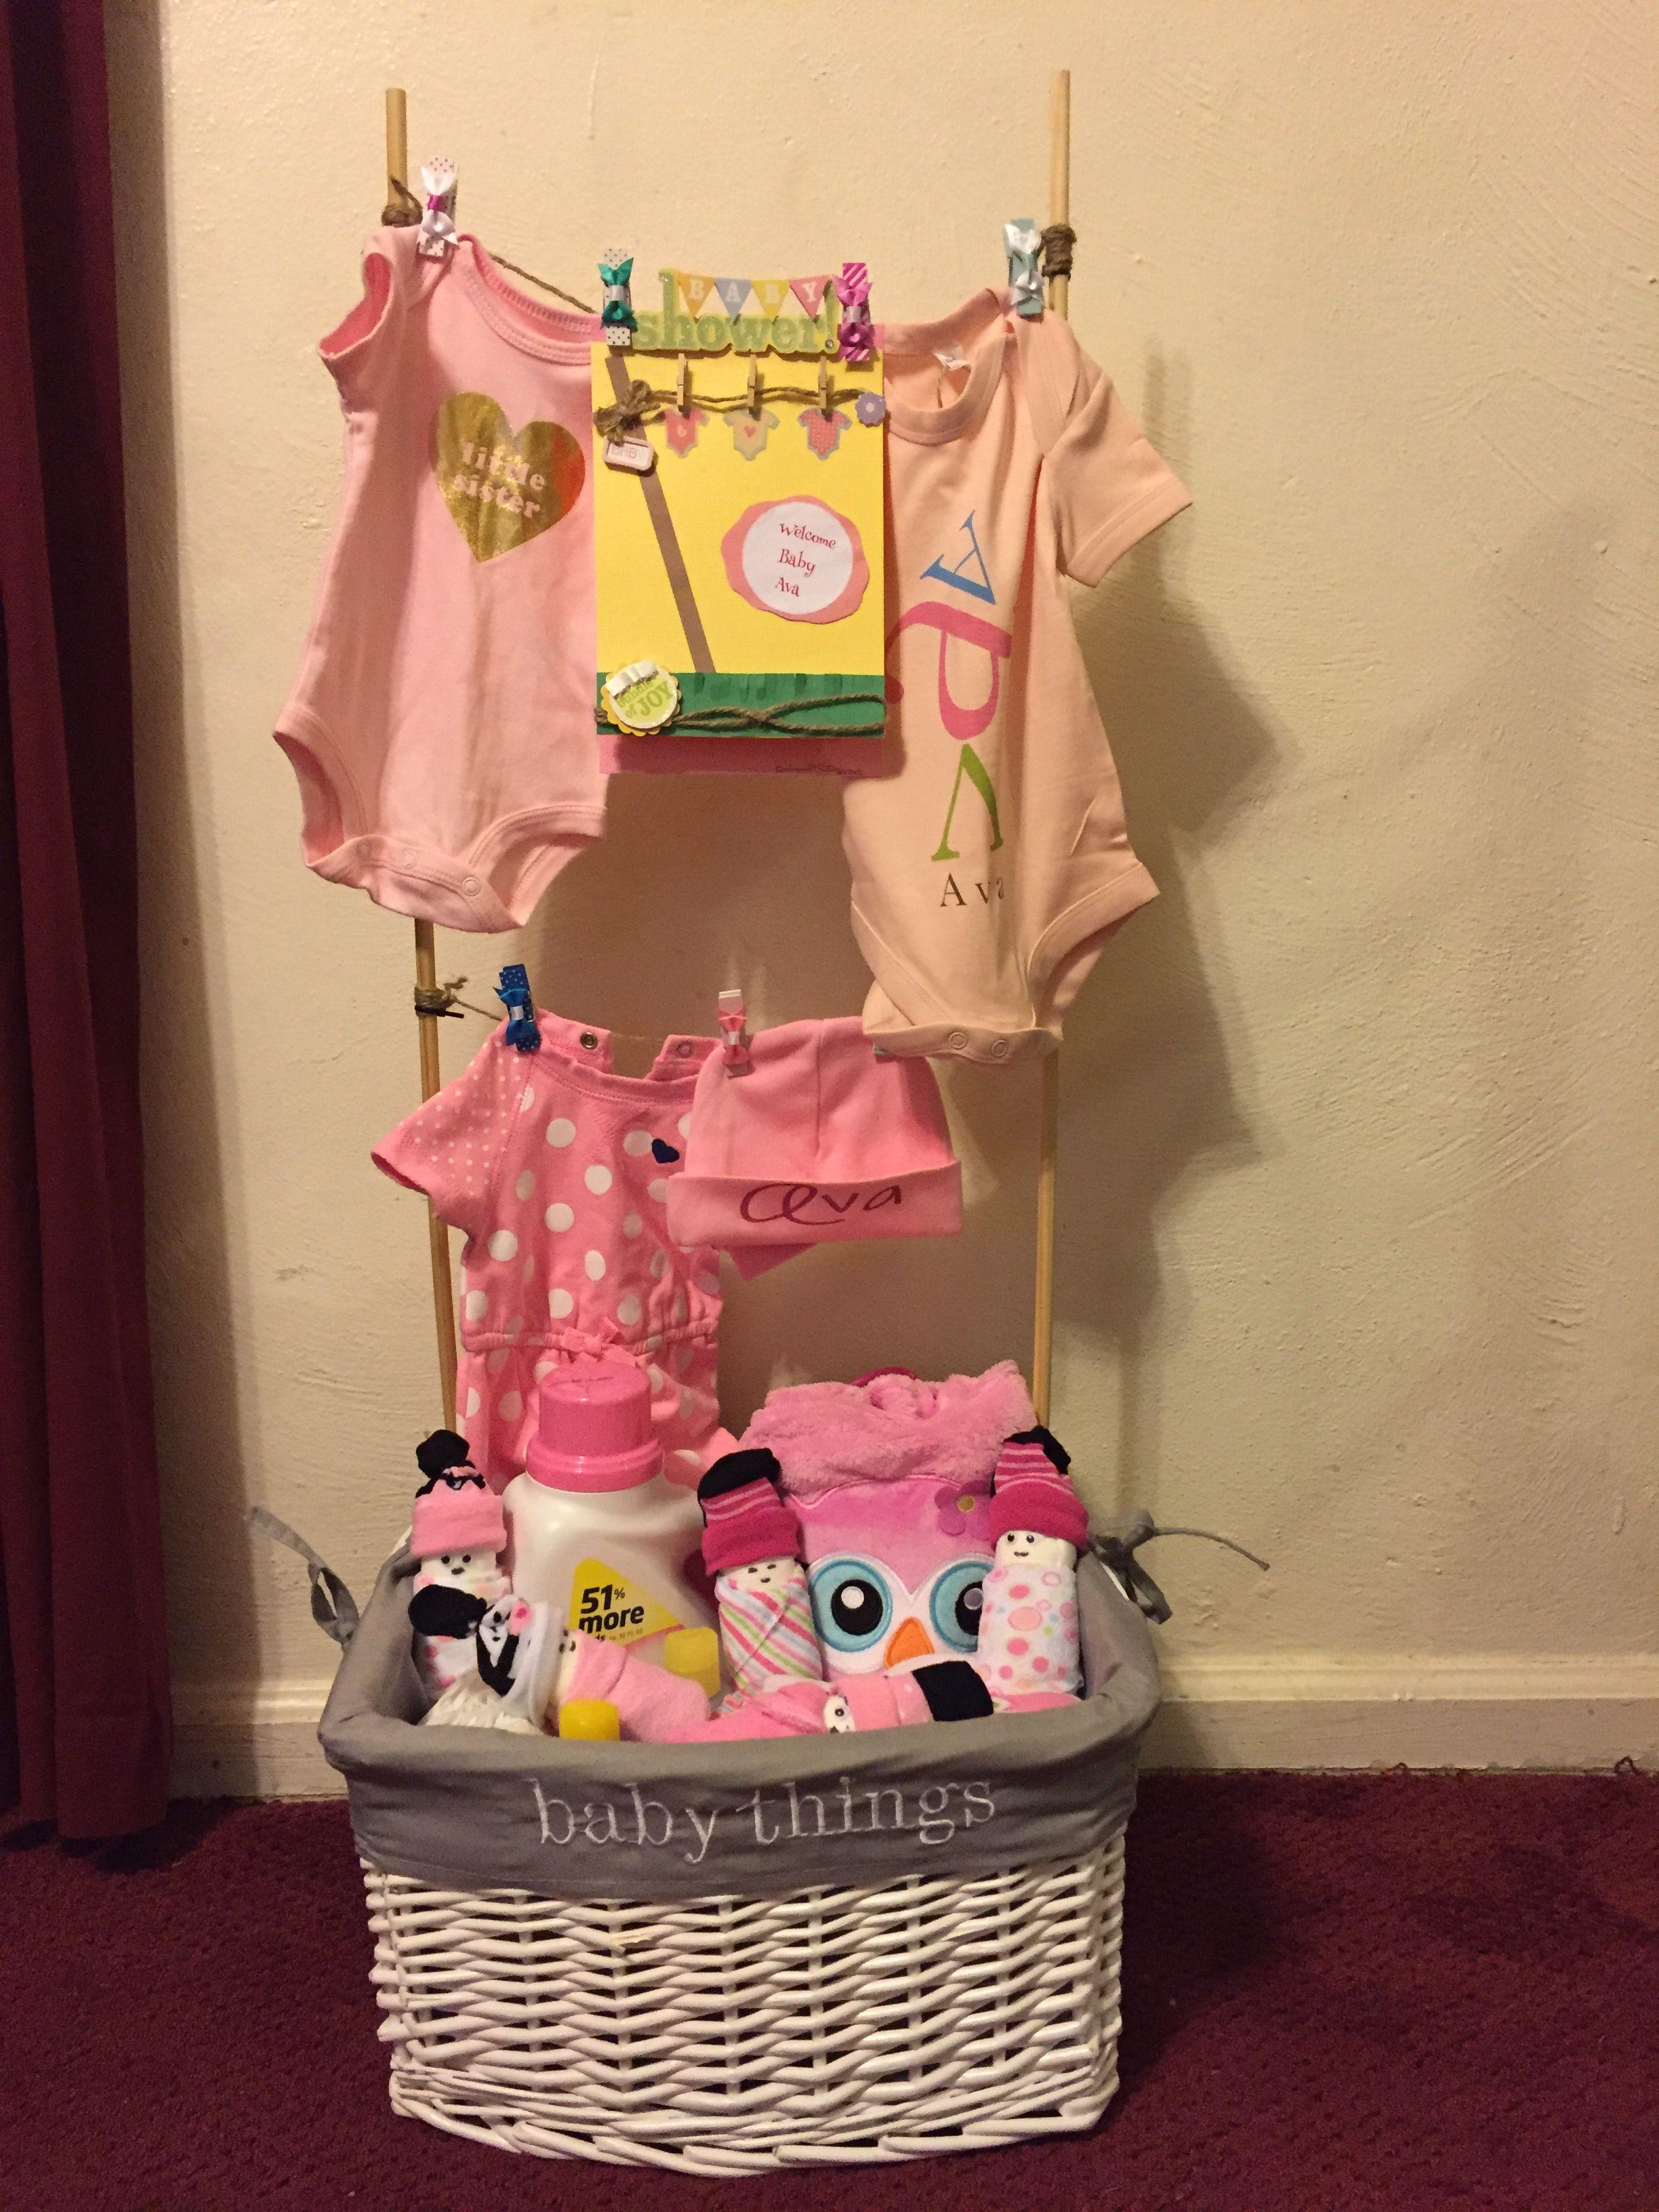 Baby clothesline laundry basket i made baby shower